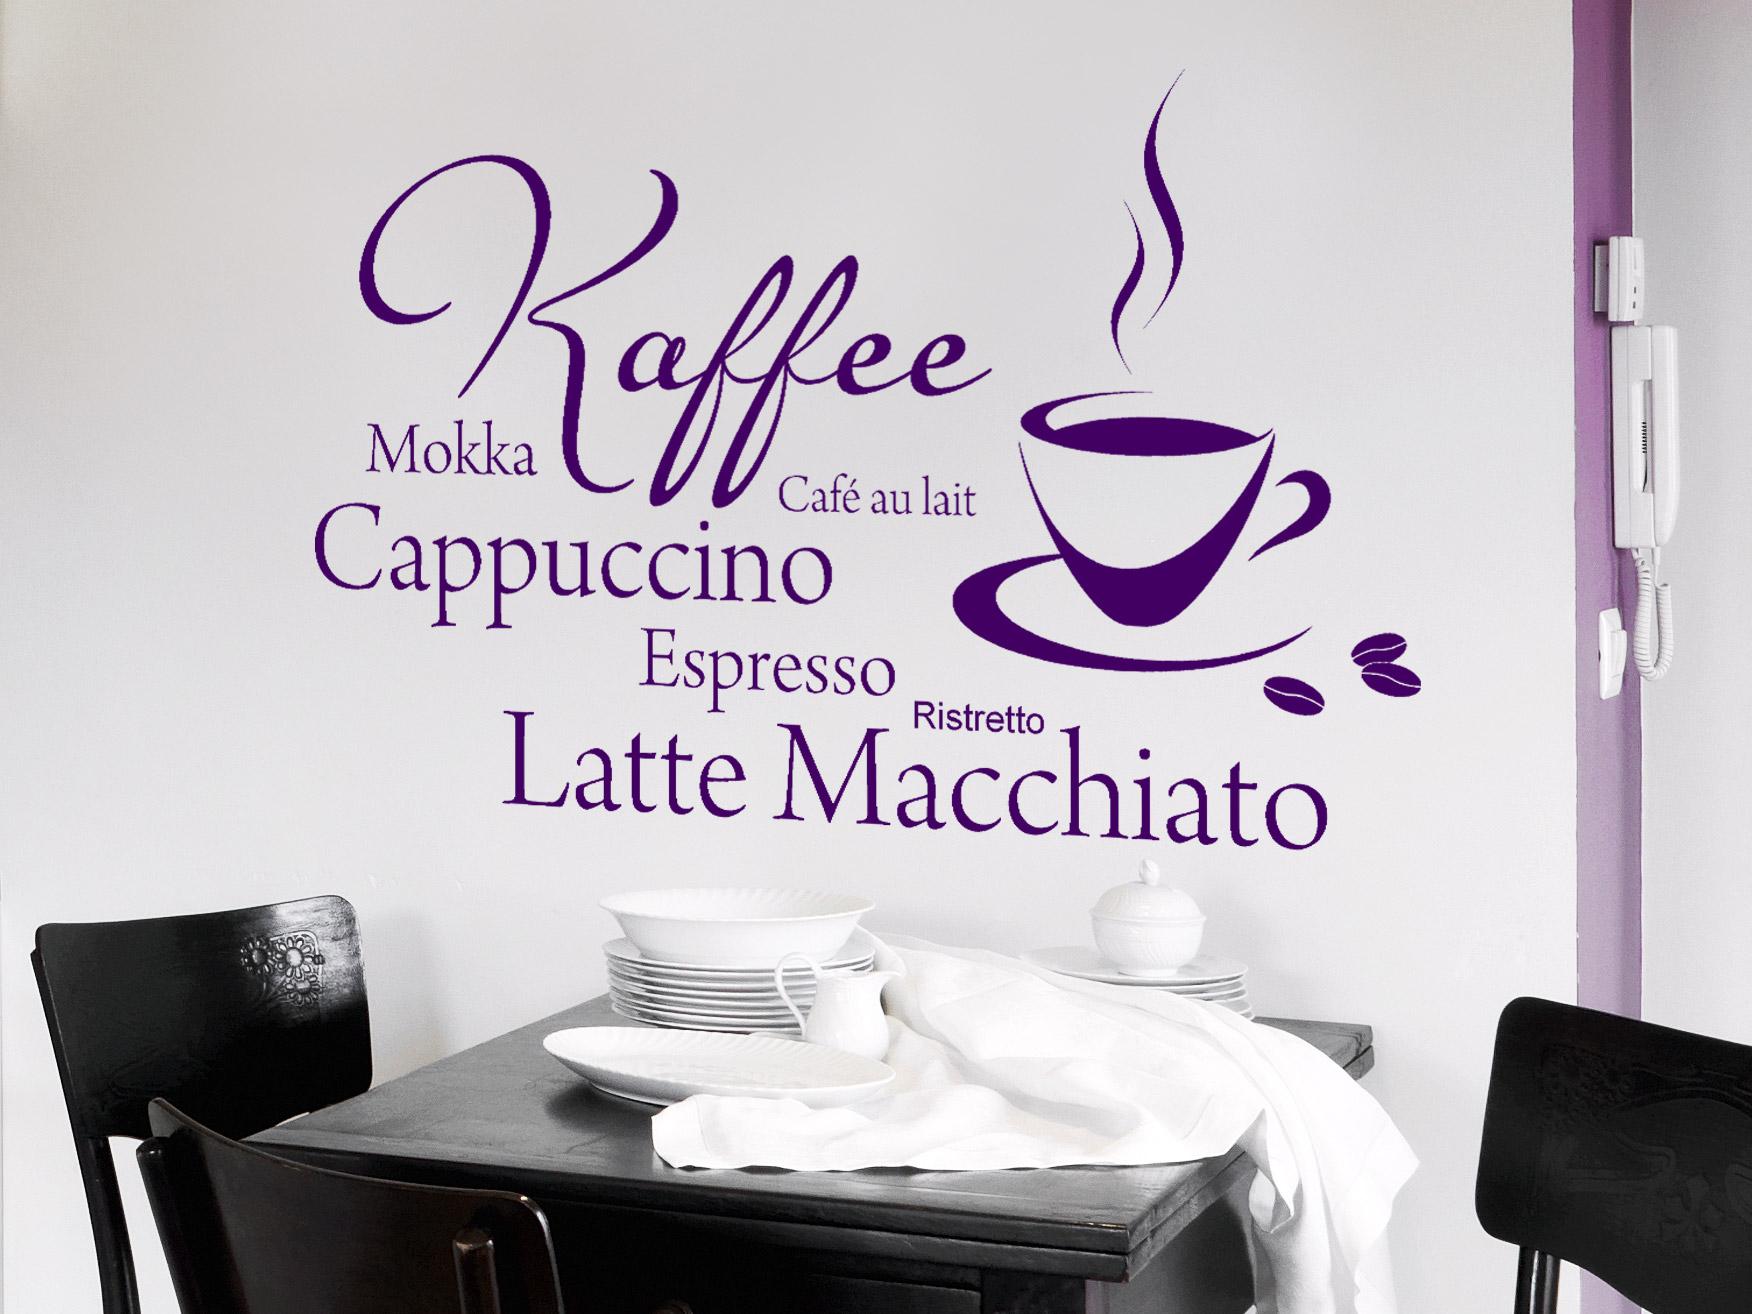 Wandtattoo Caf Time mit Kaffeetasse  WANDTATTOODE